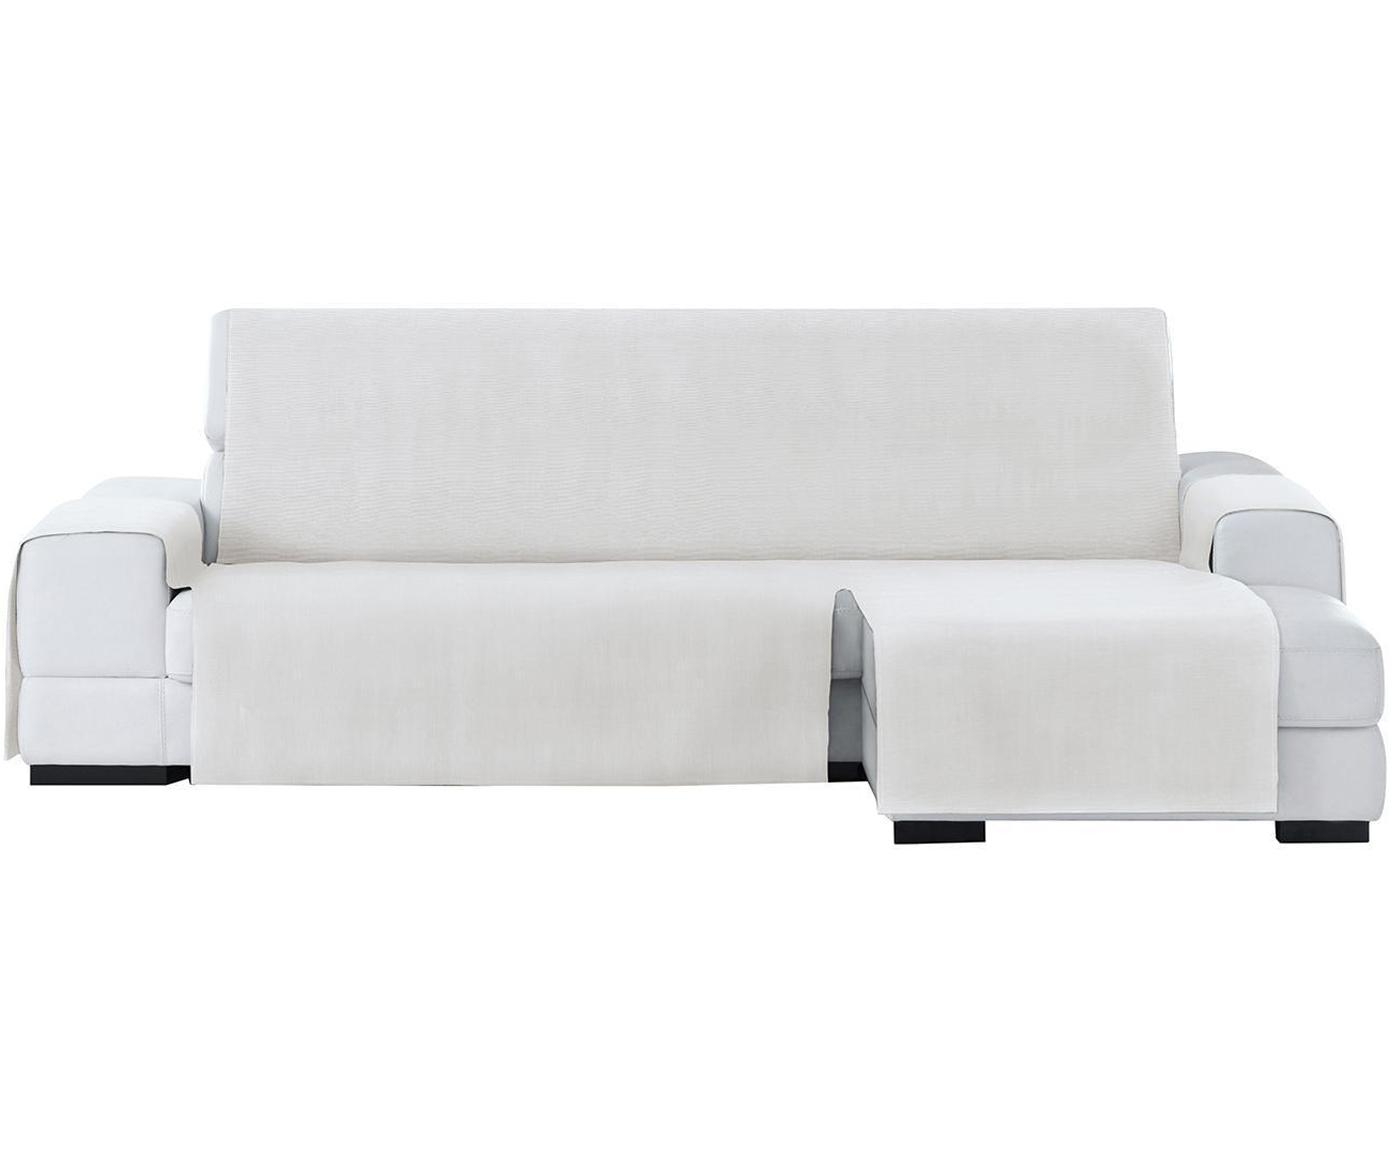 Funda de sofá Levante, 50%algodón, 50%poliéster, Blanco, Brazo corto (240 cm)